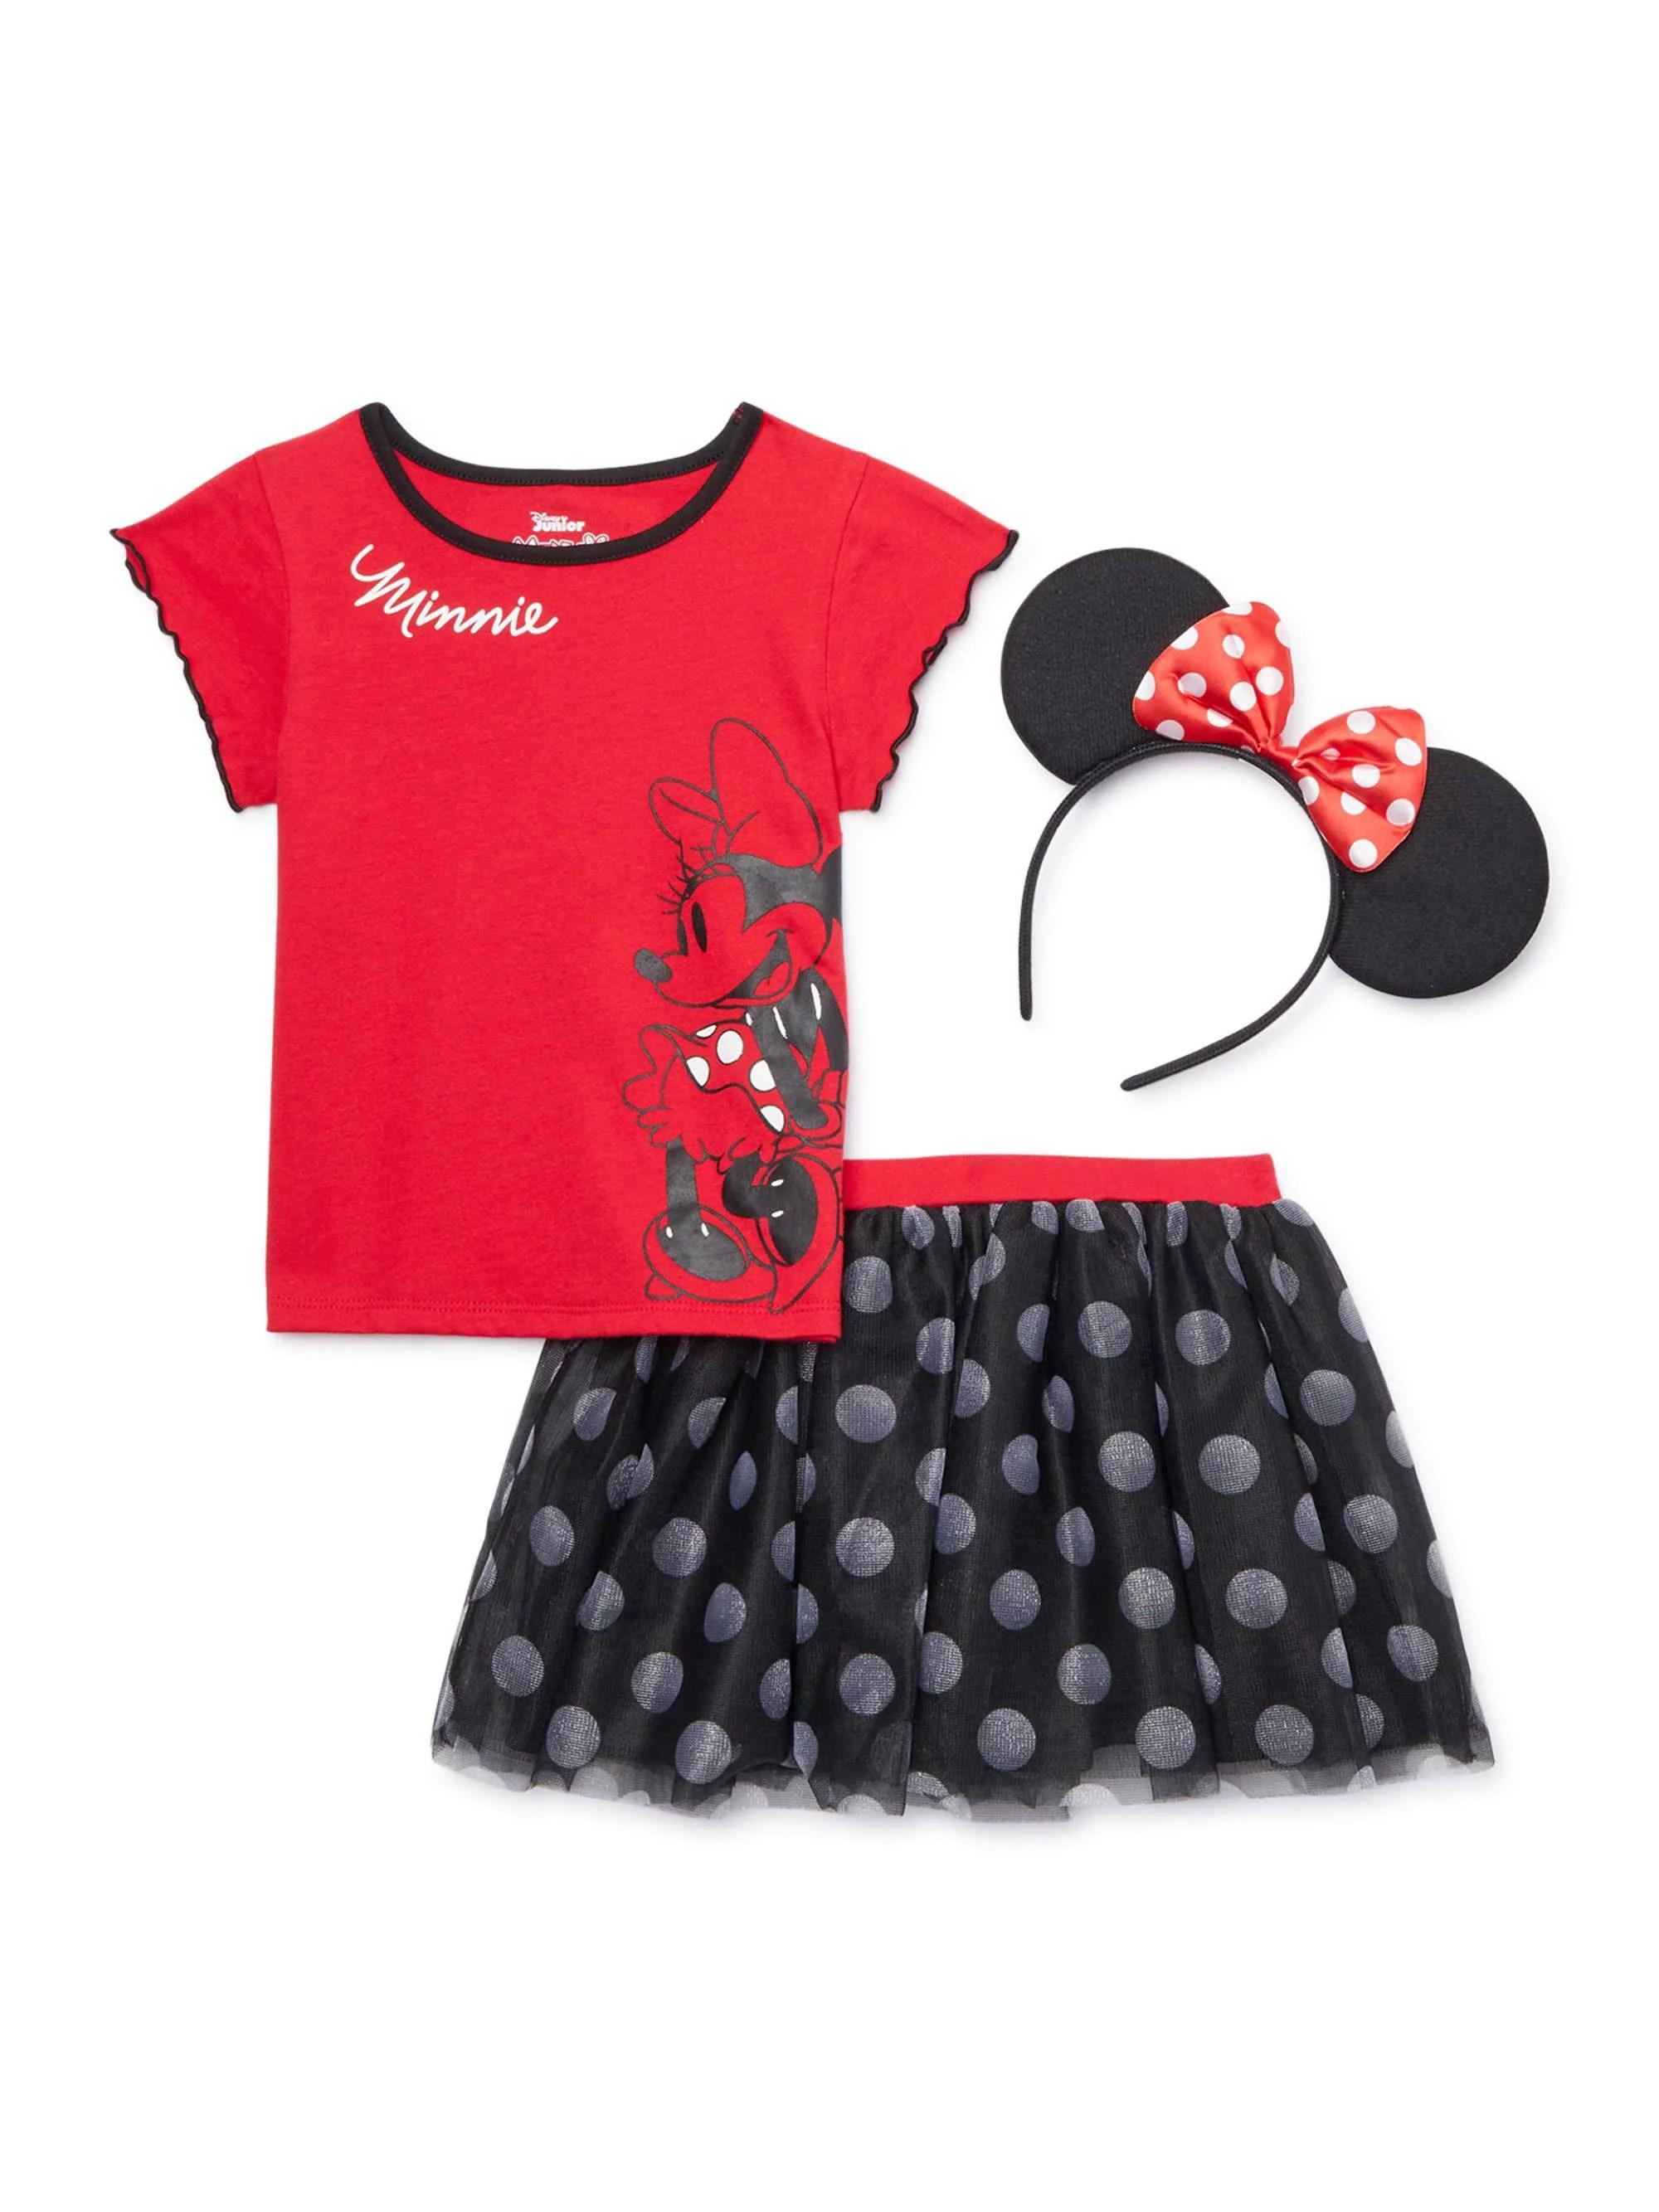 Minnie Mouse Girls Outfit Sets Walmart Com